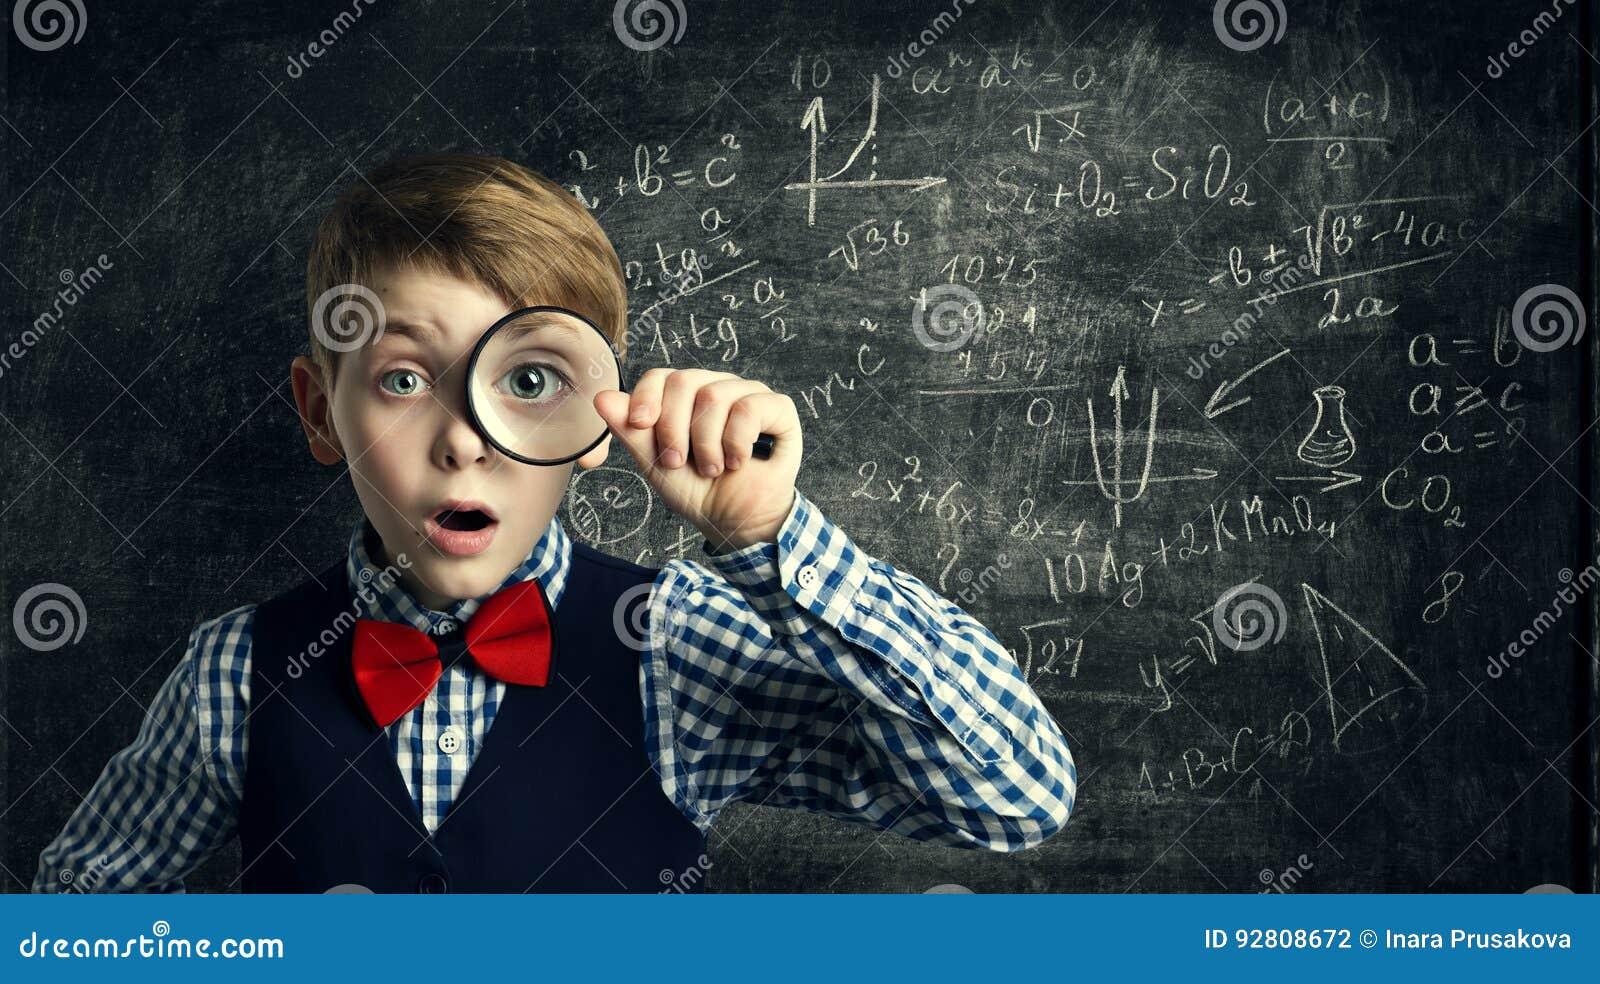 Child Magnifying Glass, Amazed School Kid, Student Boy with Magnifier Study Mathematics, Math Education